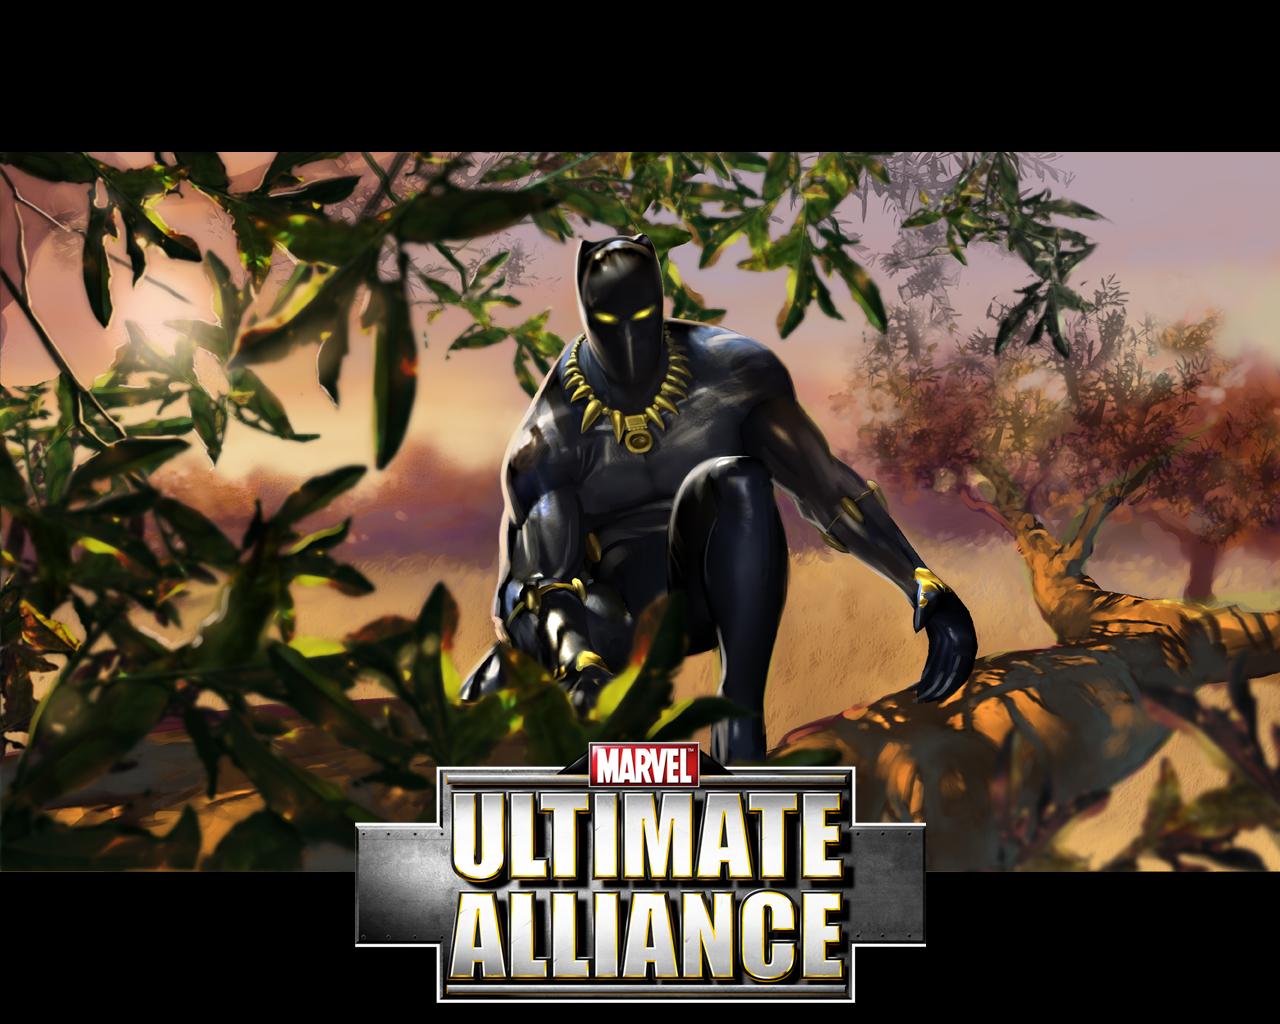 black panther marvel ultimate alliance wallpaper black panther 1280x1024